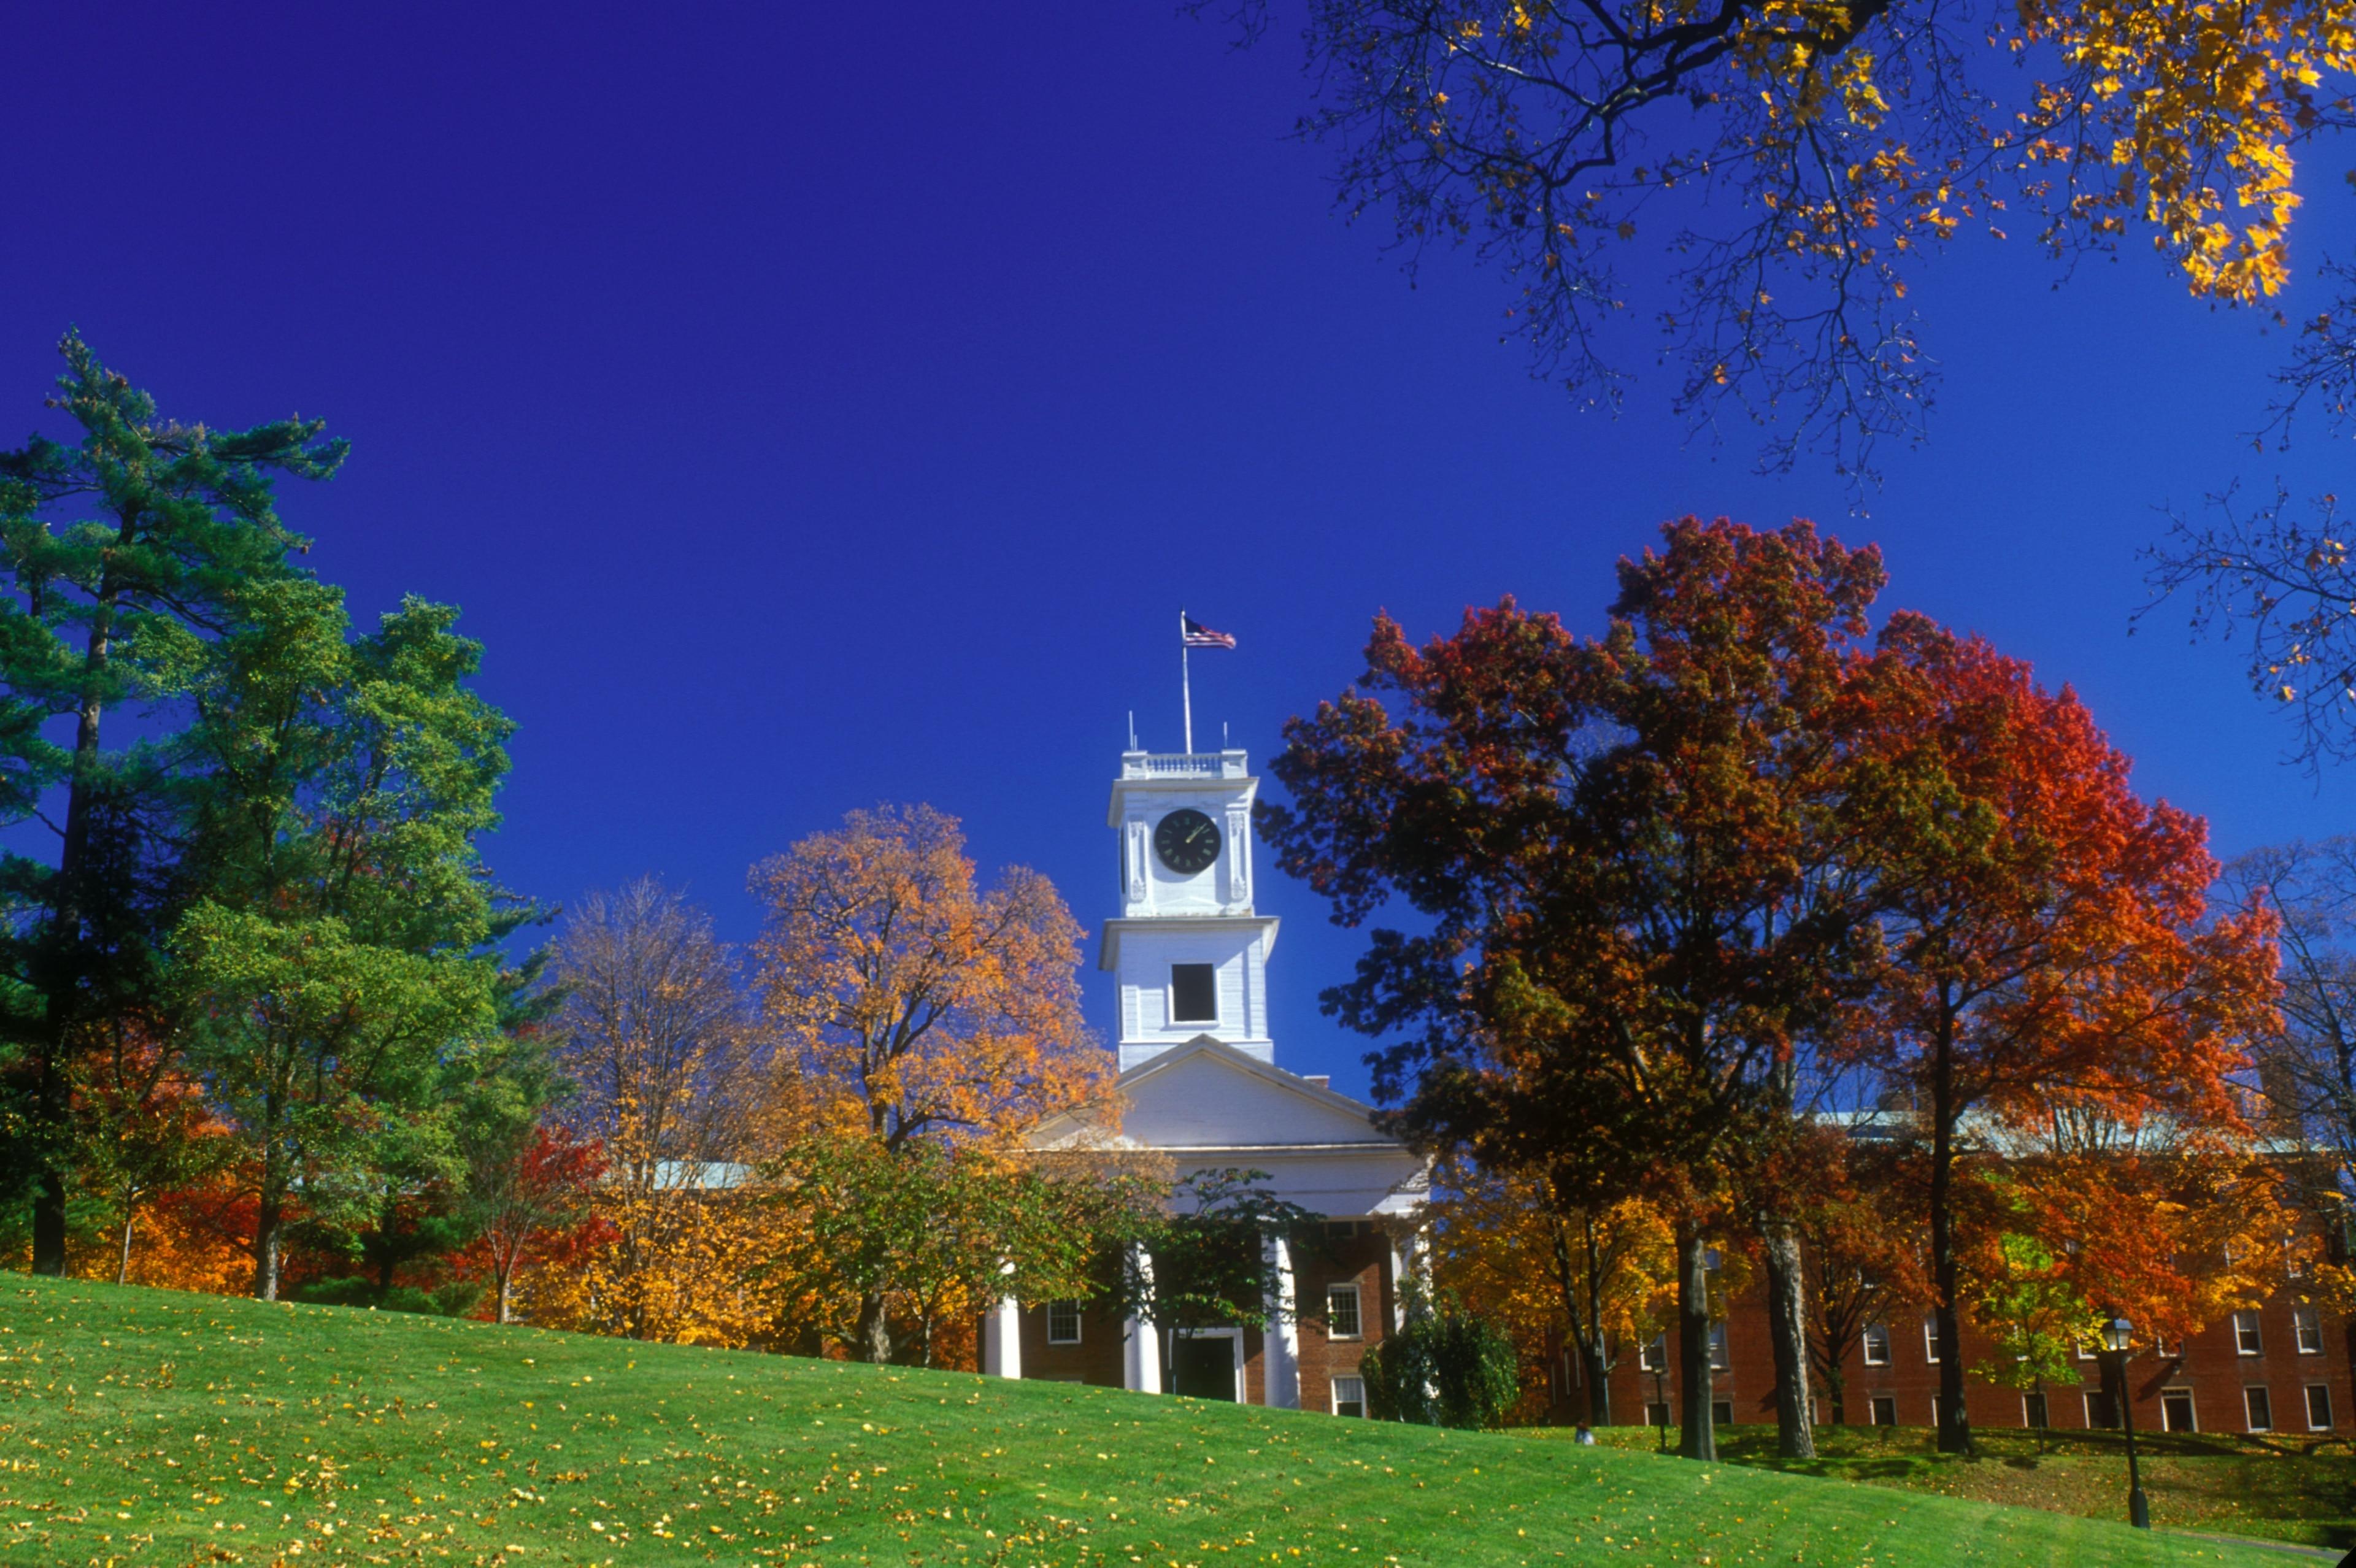 Amherst, Massachusetts, United States of America